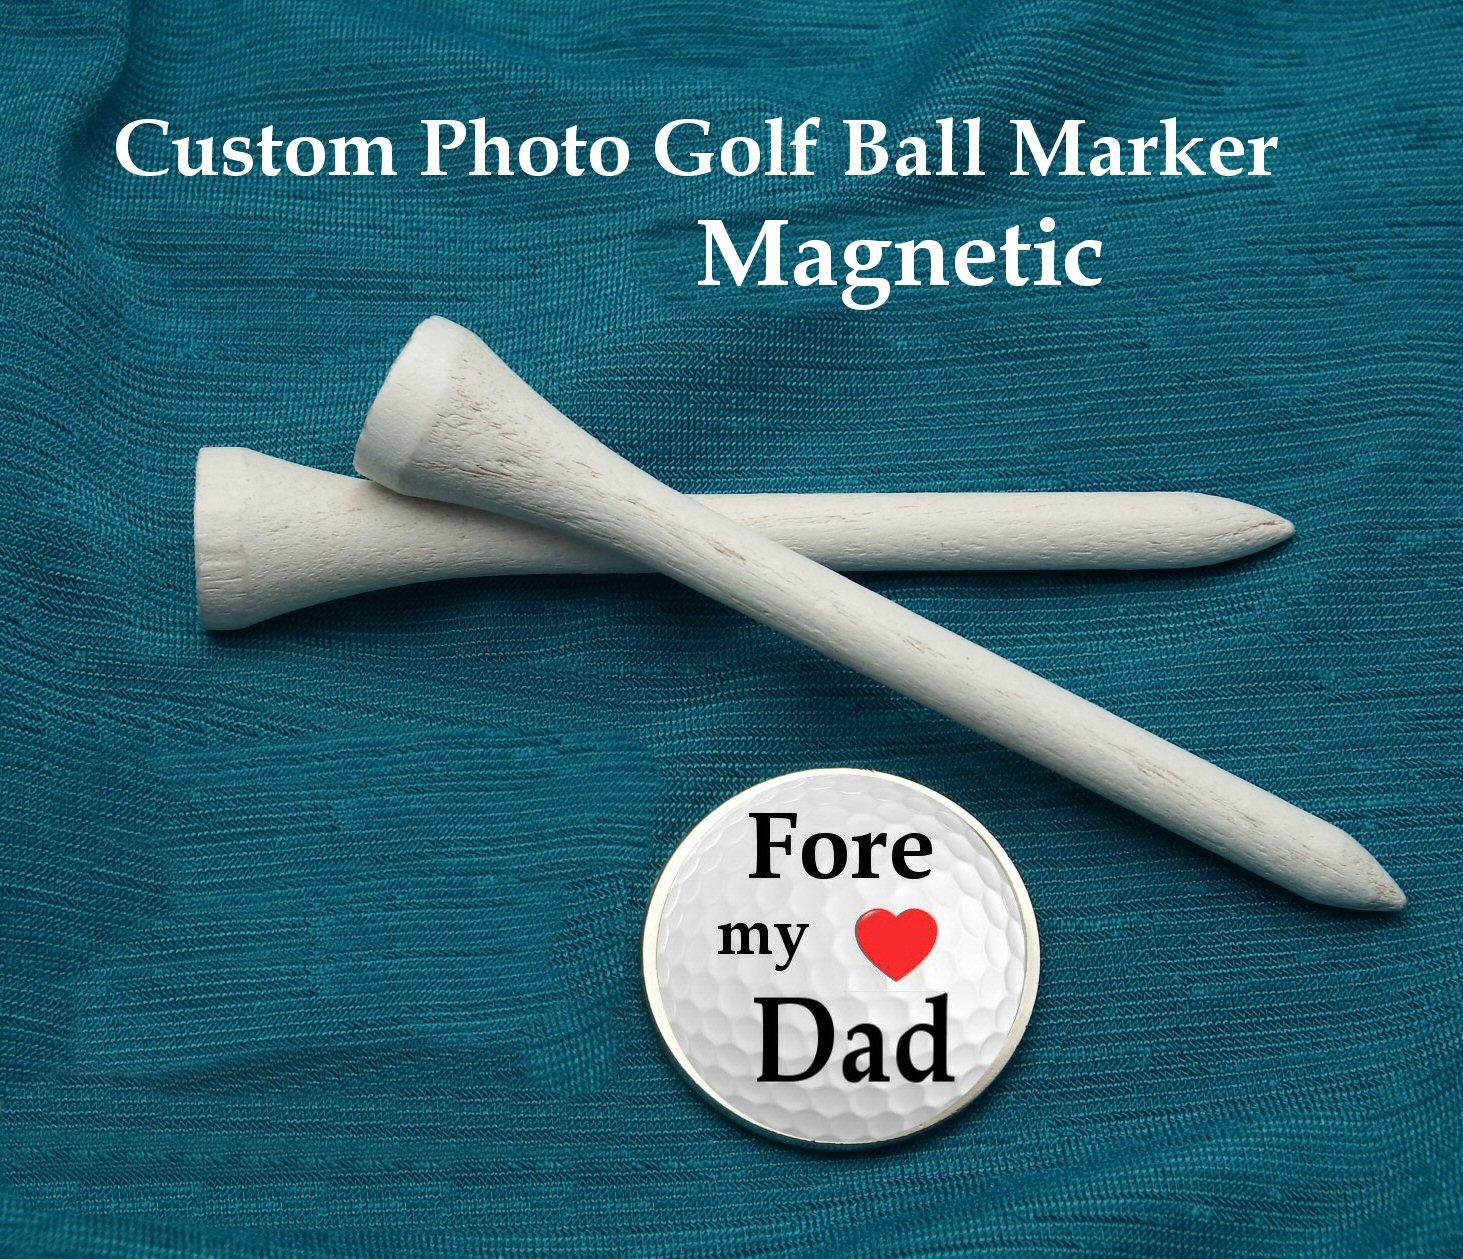 Magnetic Golf Ball Markers Az Charms Links Llc